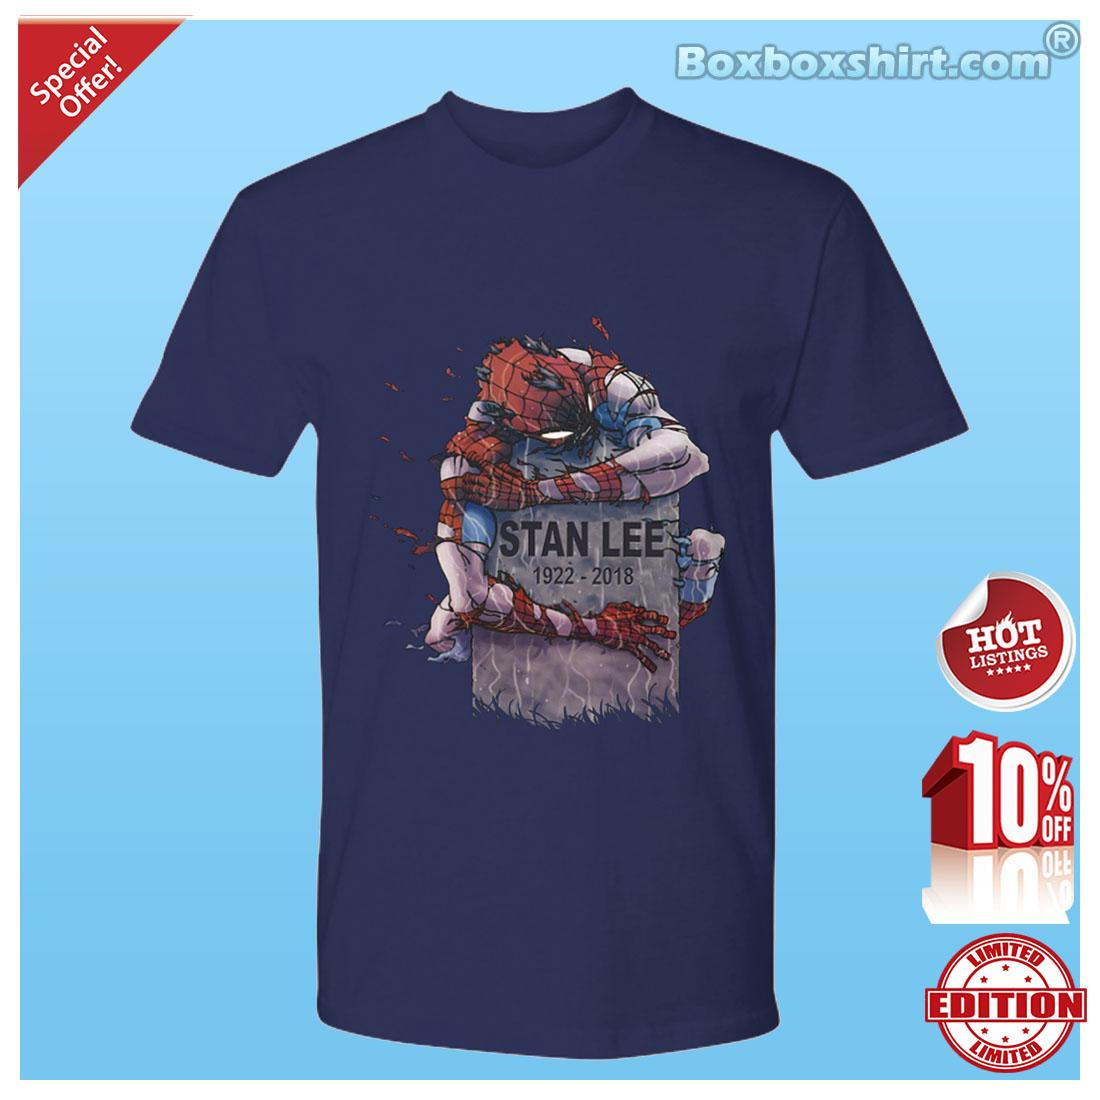 462a0342 Spider man hugging Stan Lee shirt and hoodie | Boxbox Branding ...